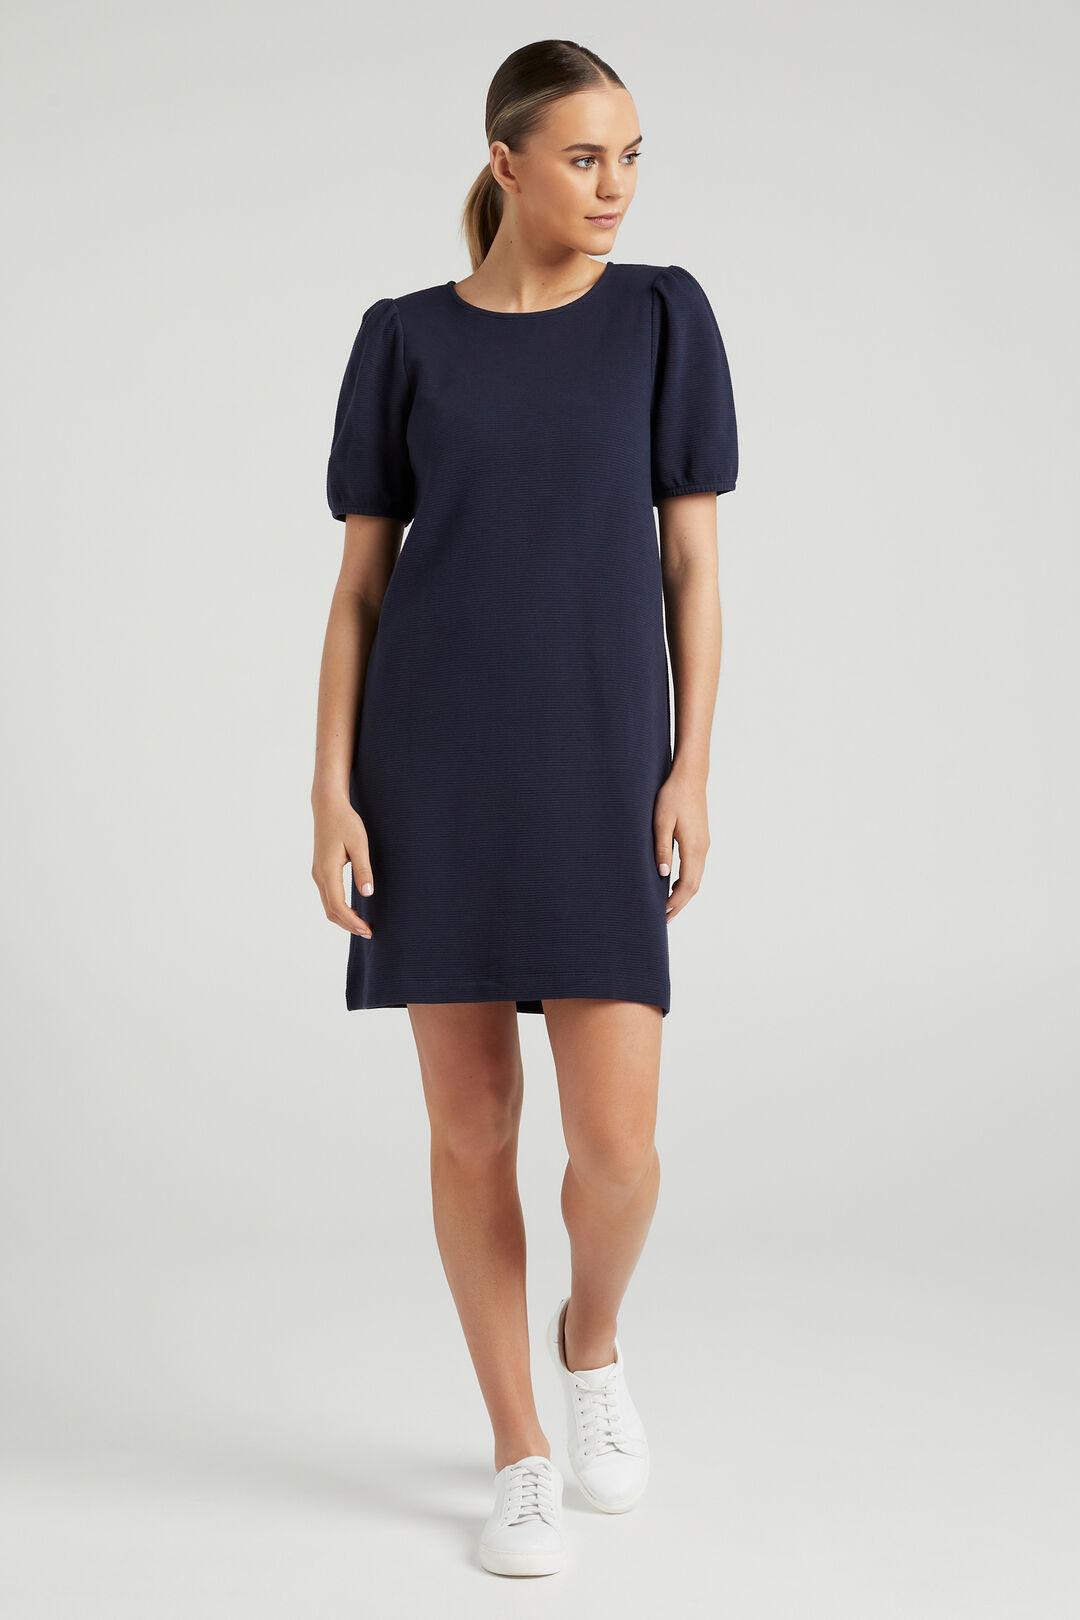 TEXTURED JERSEY DRESS  NAVY  hi-res